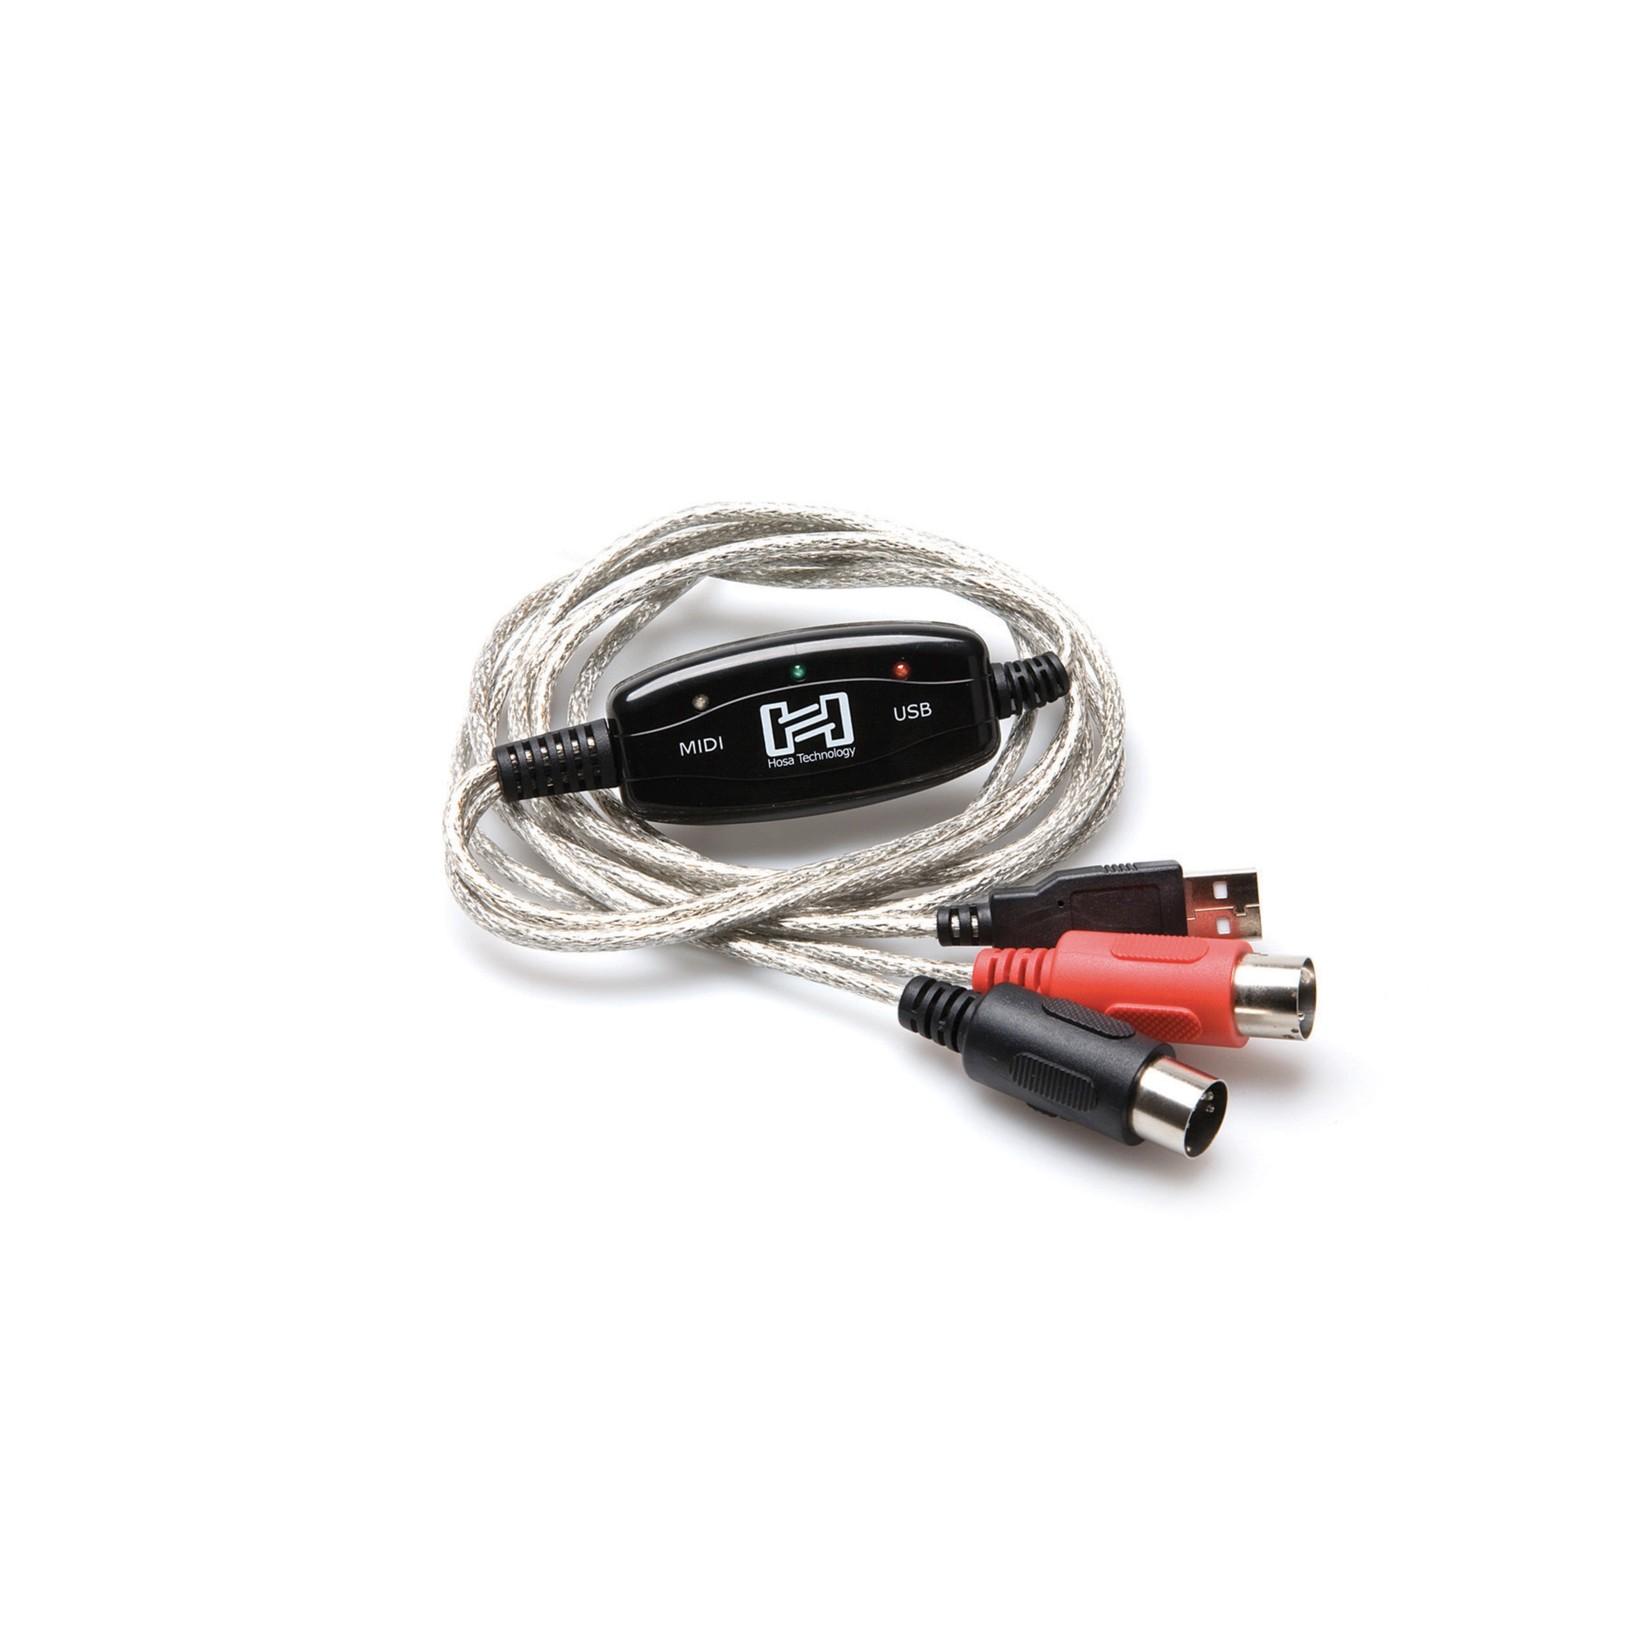 Hosa Hosa TrackLink MIDI to USB Interface, MIDI I/O to USB Type A, 6 ft (USM-422), Plug and Play!